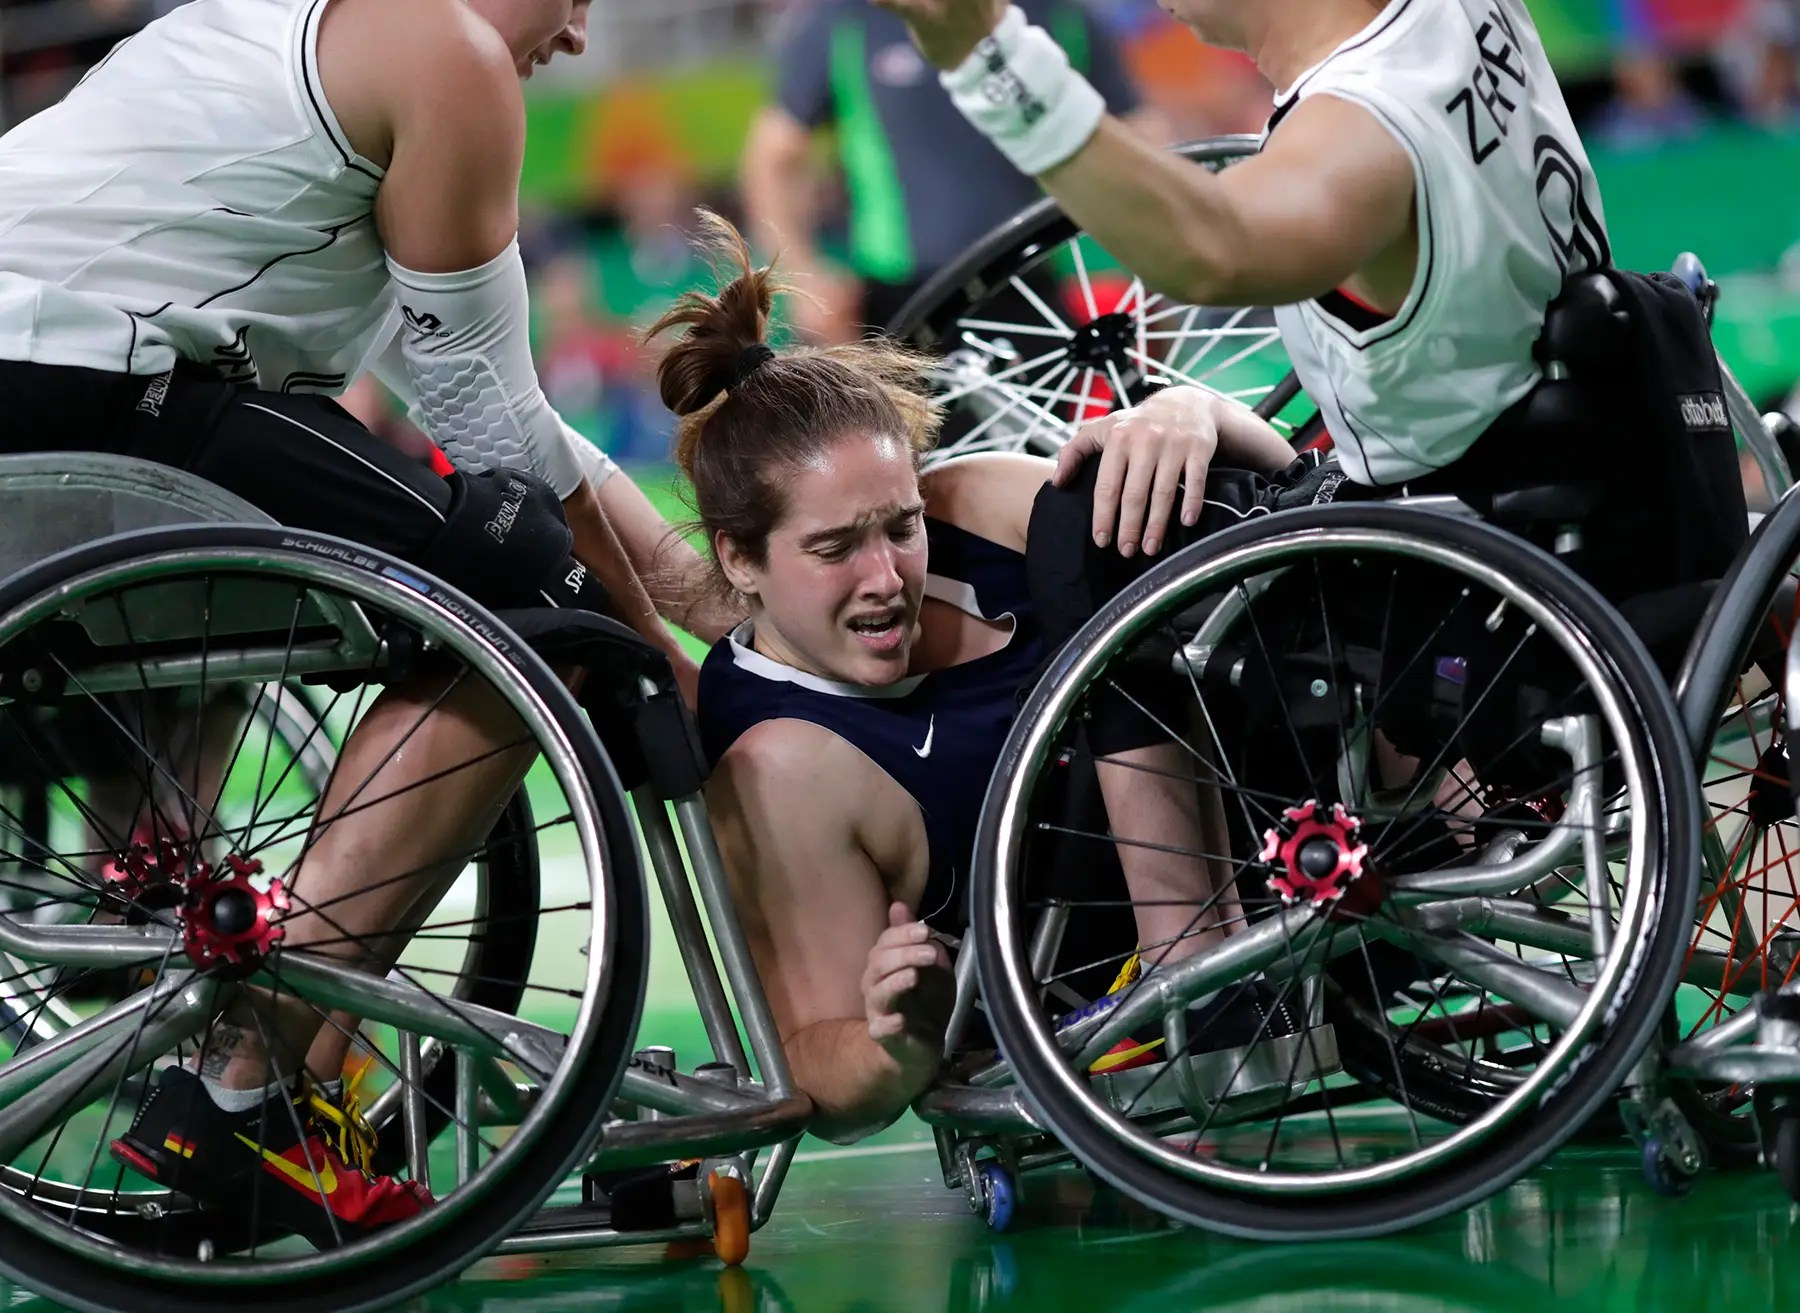 Rebecca Murray equipo de EE.UU. se intercala durante un partido de baloncesto en silla de ruedas.